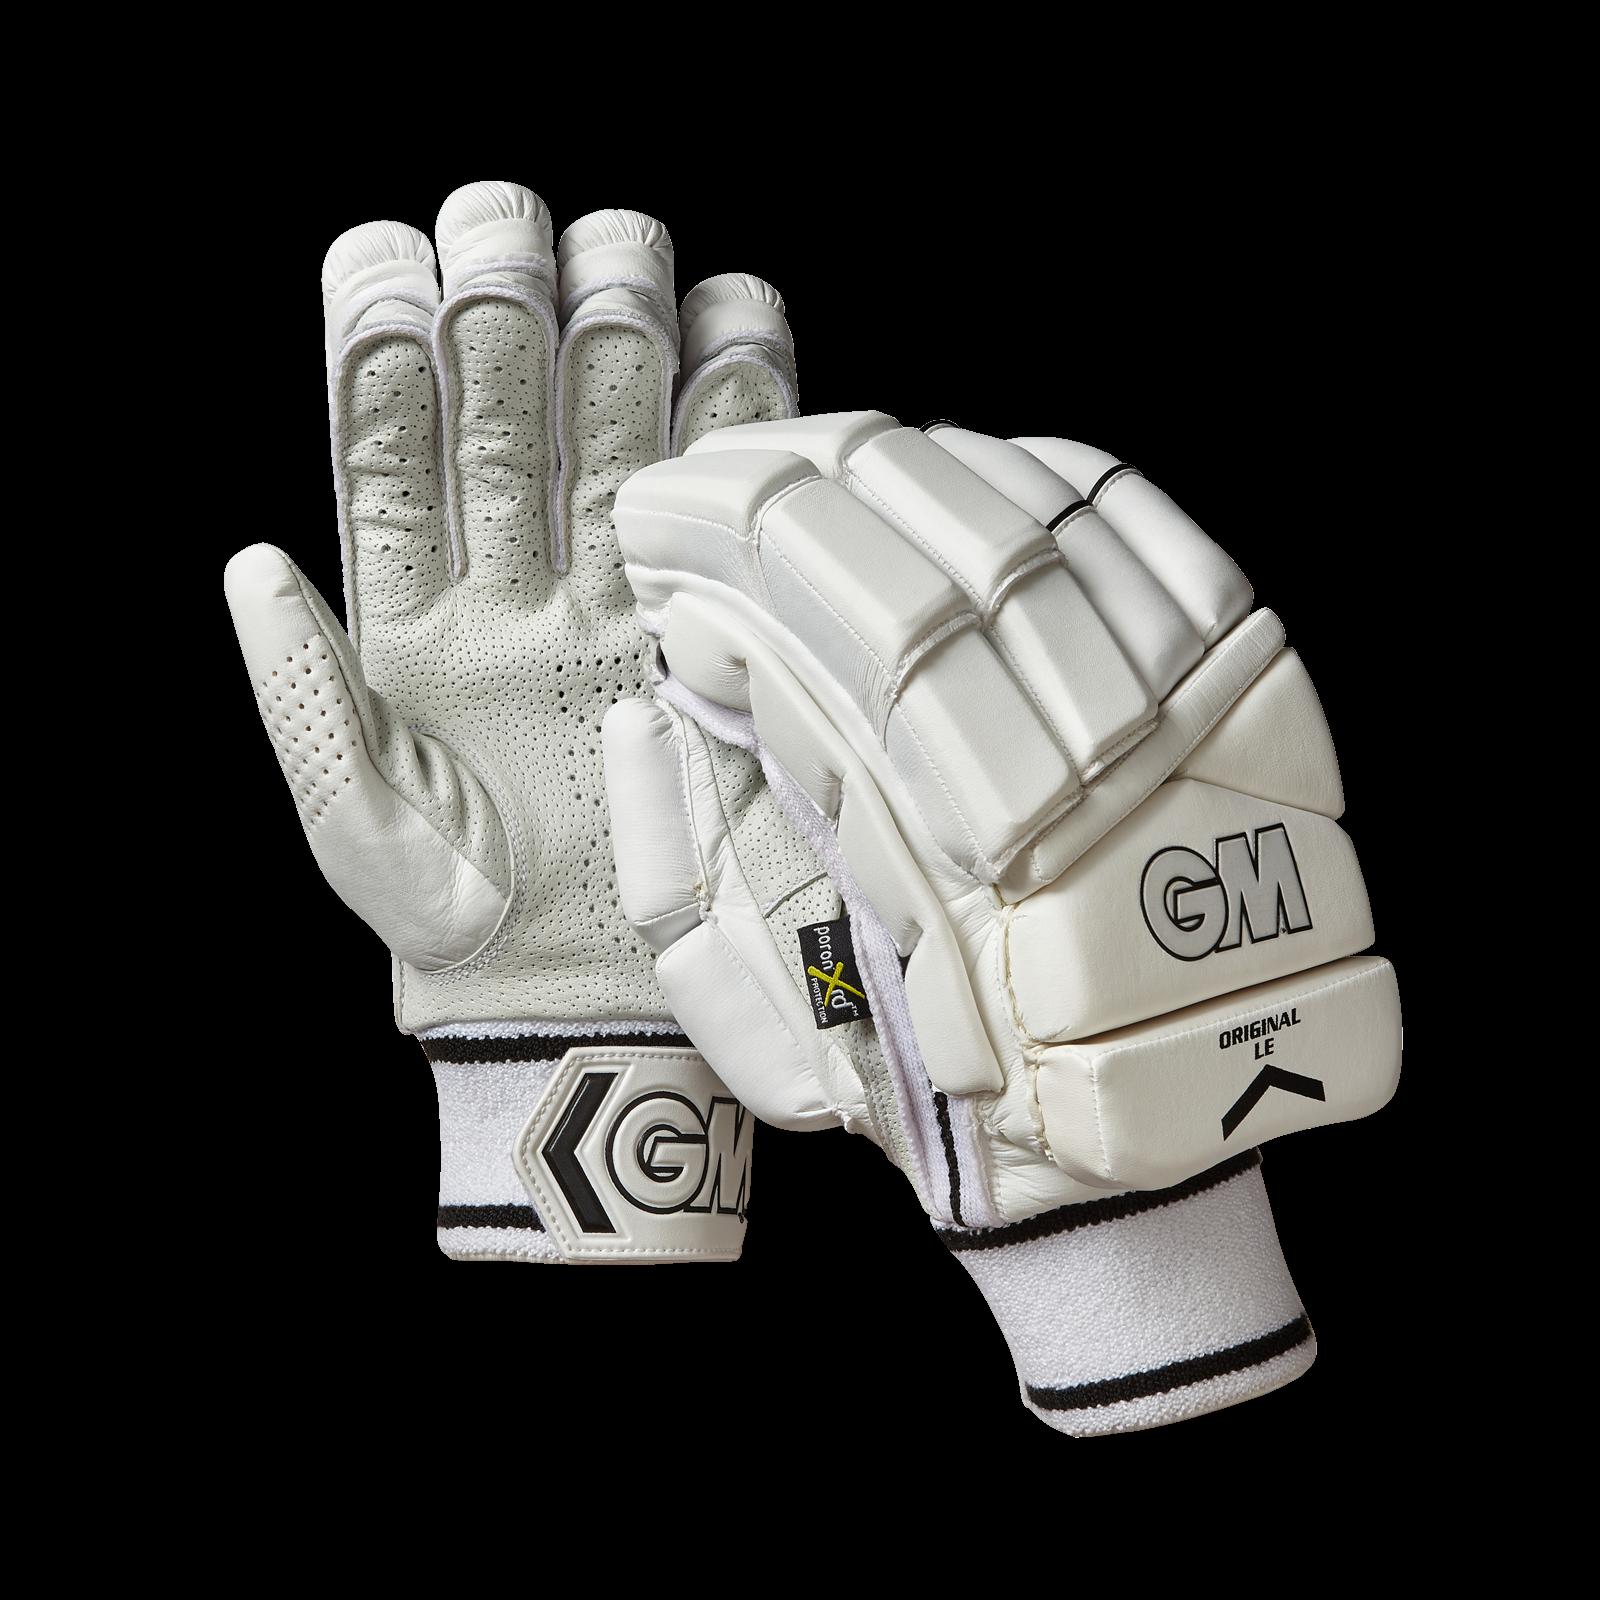 2021 Gunn and Moore Original Limited Edition Batting Gloves